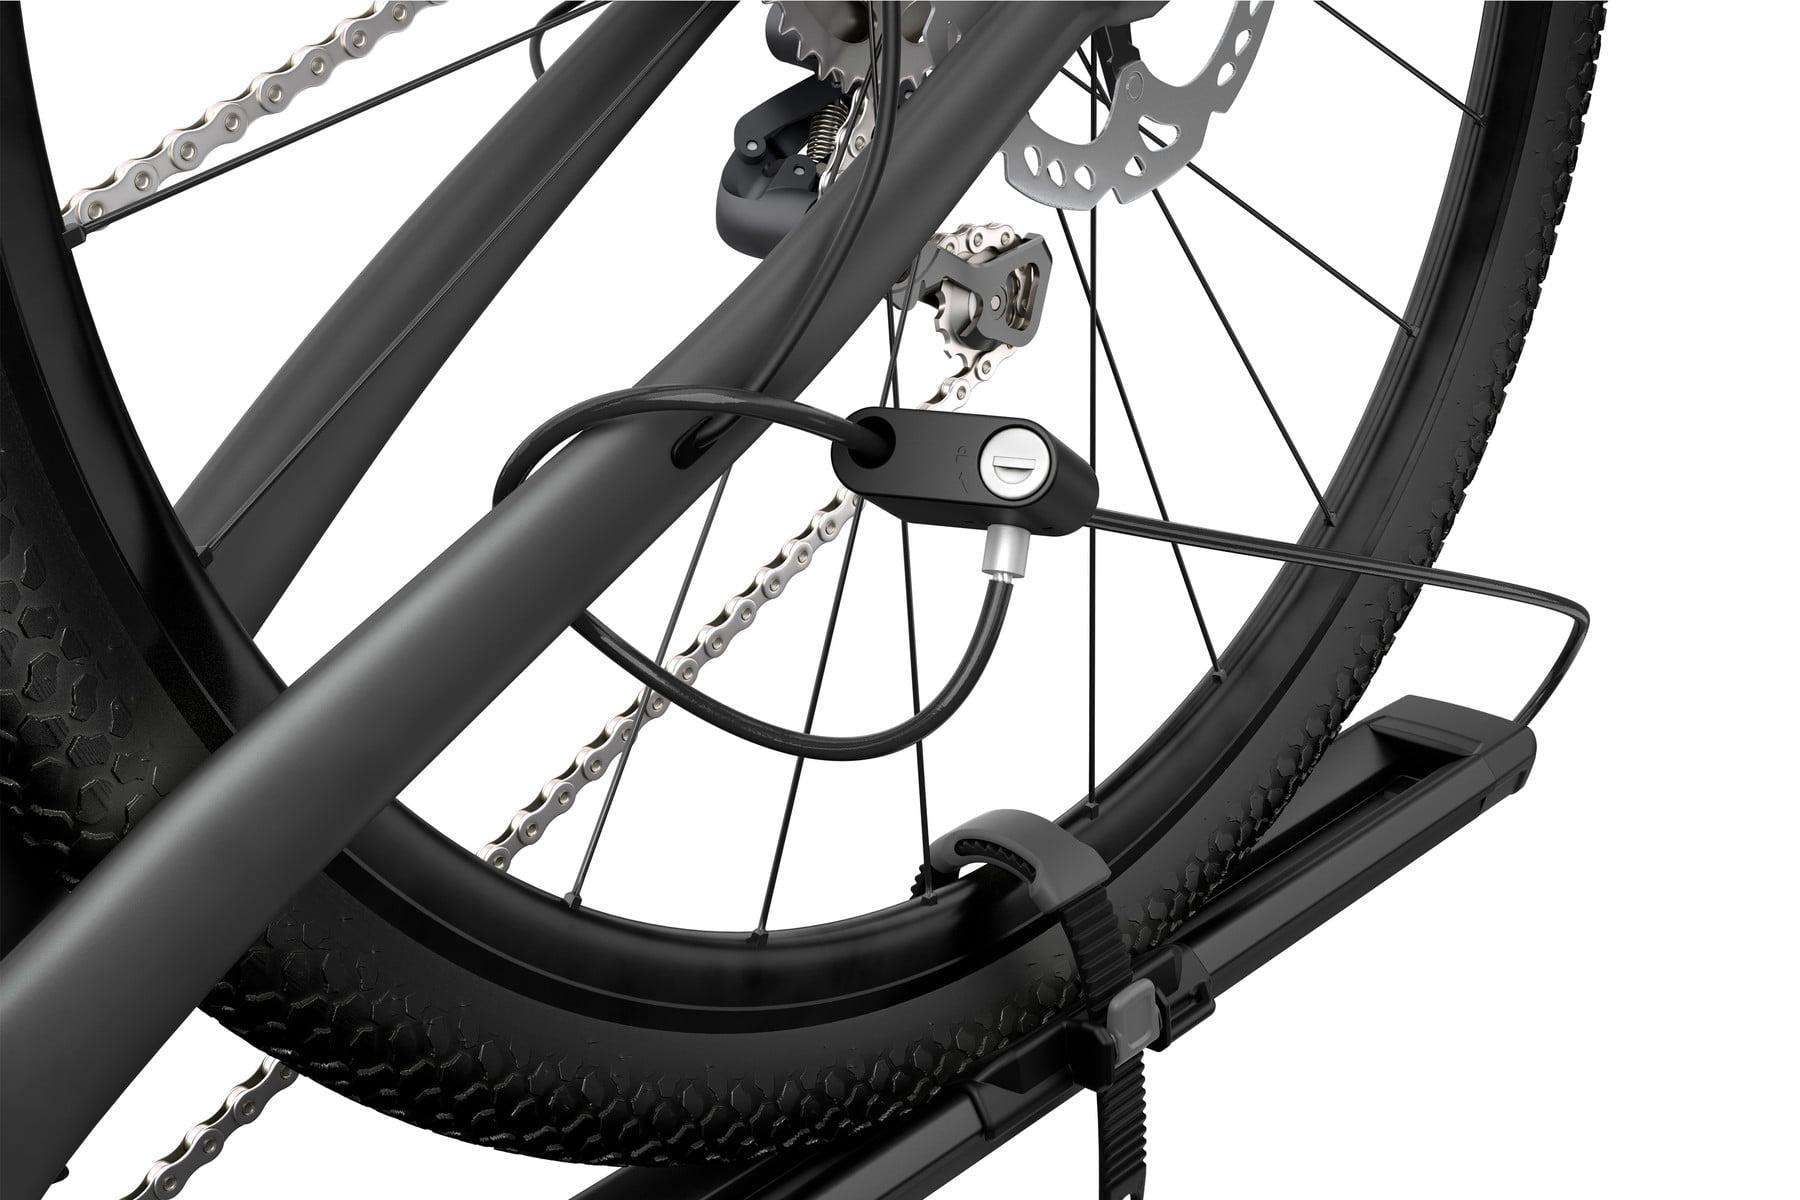 Suport biciclete Thule FastRide cu prindere pe bare transversale 7